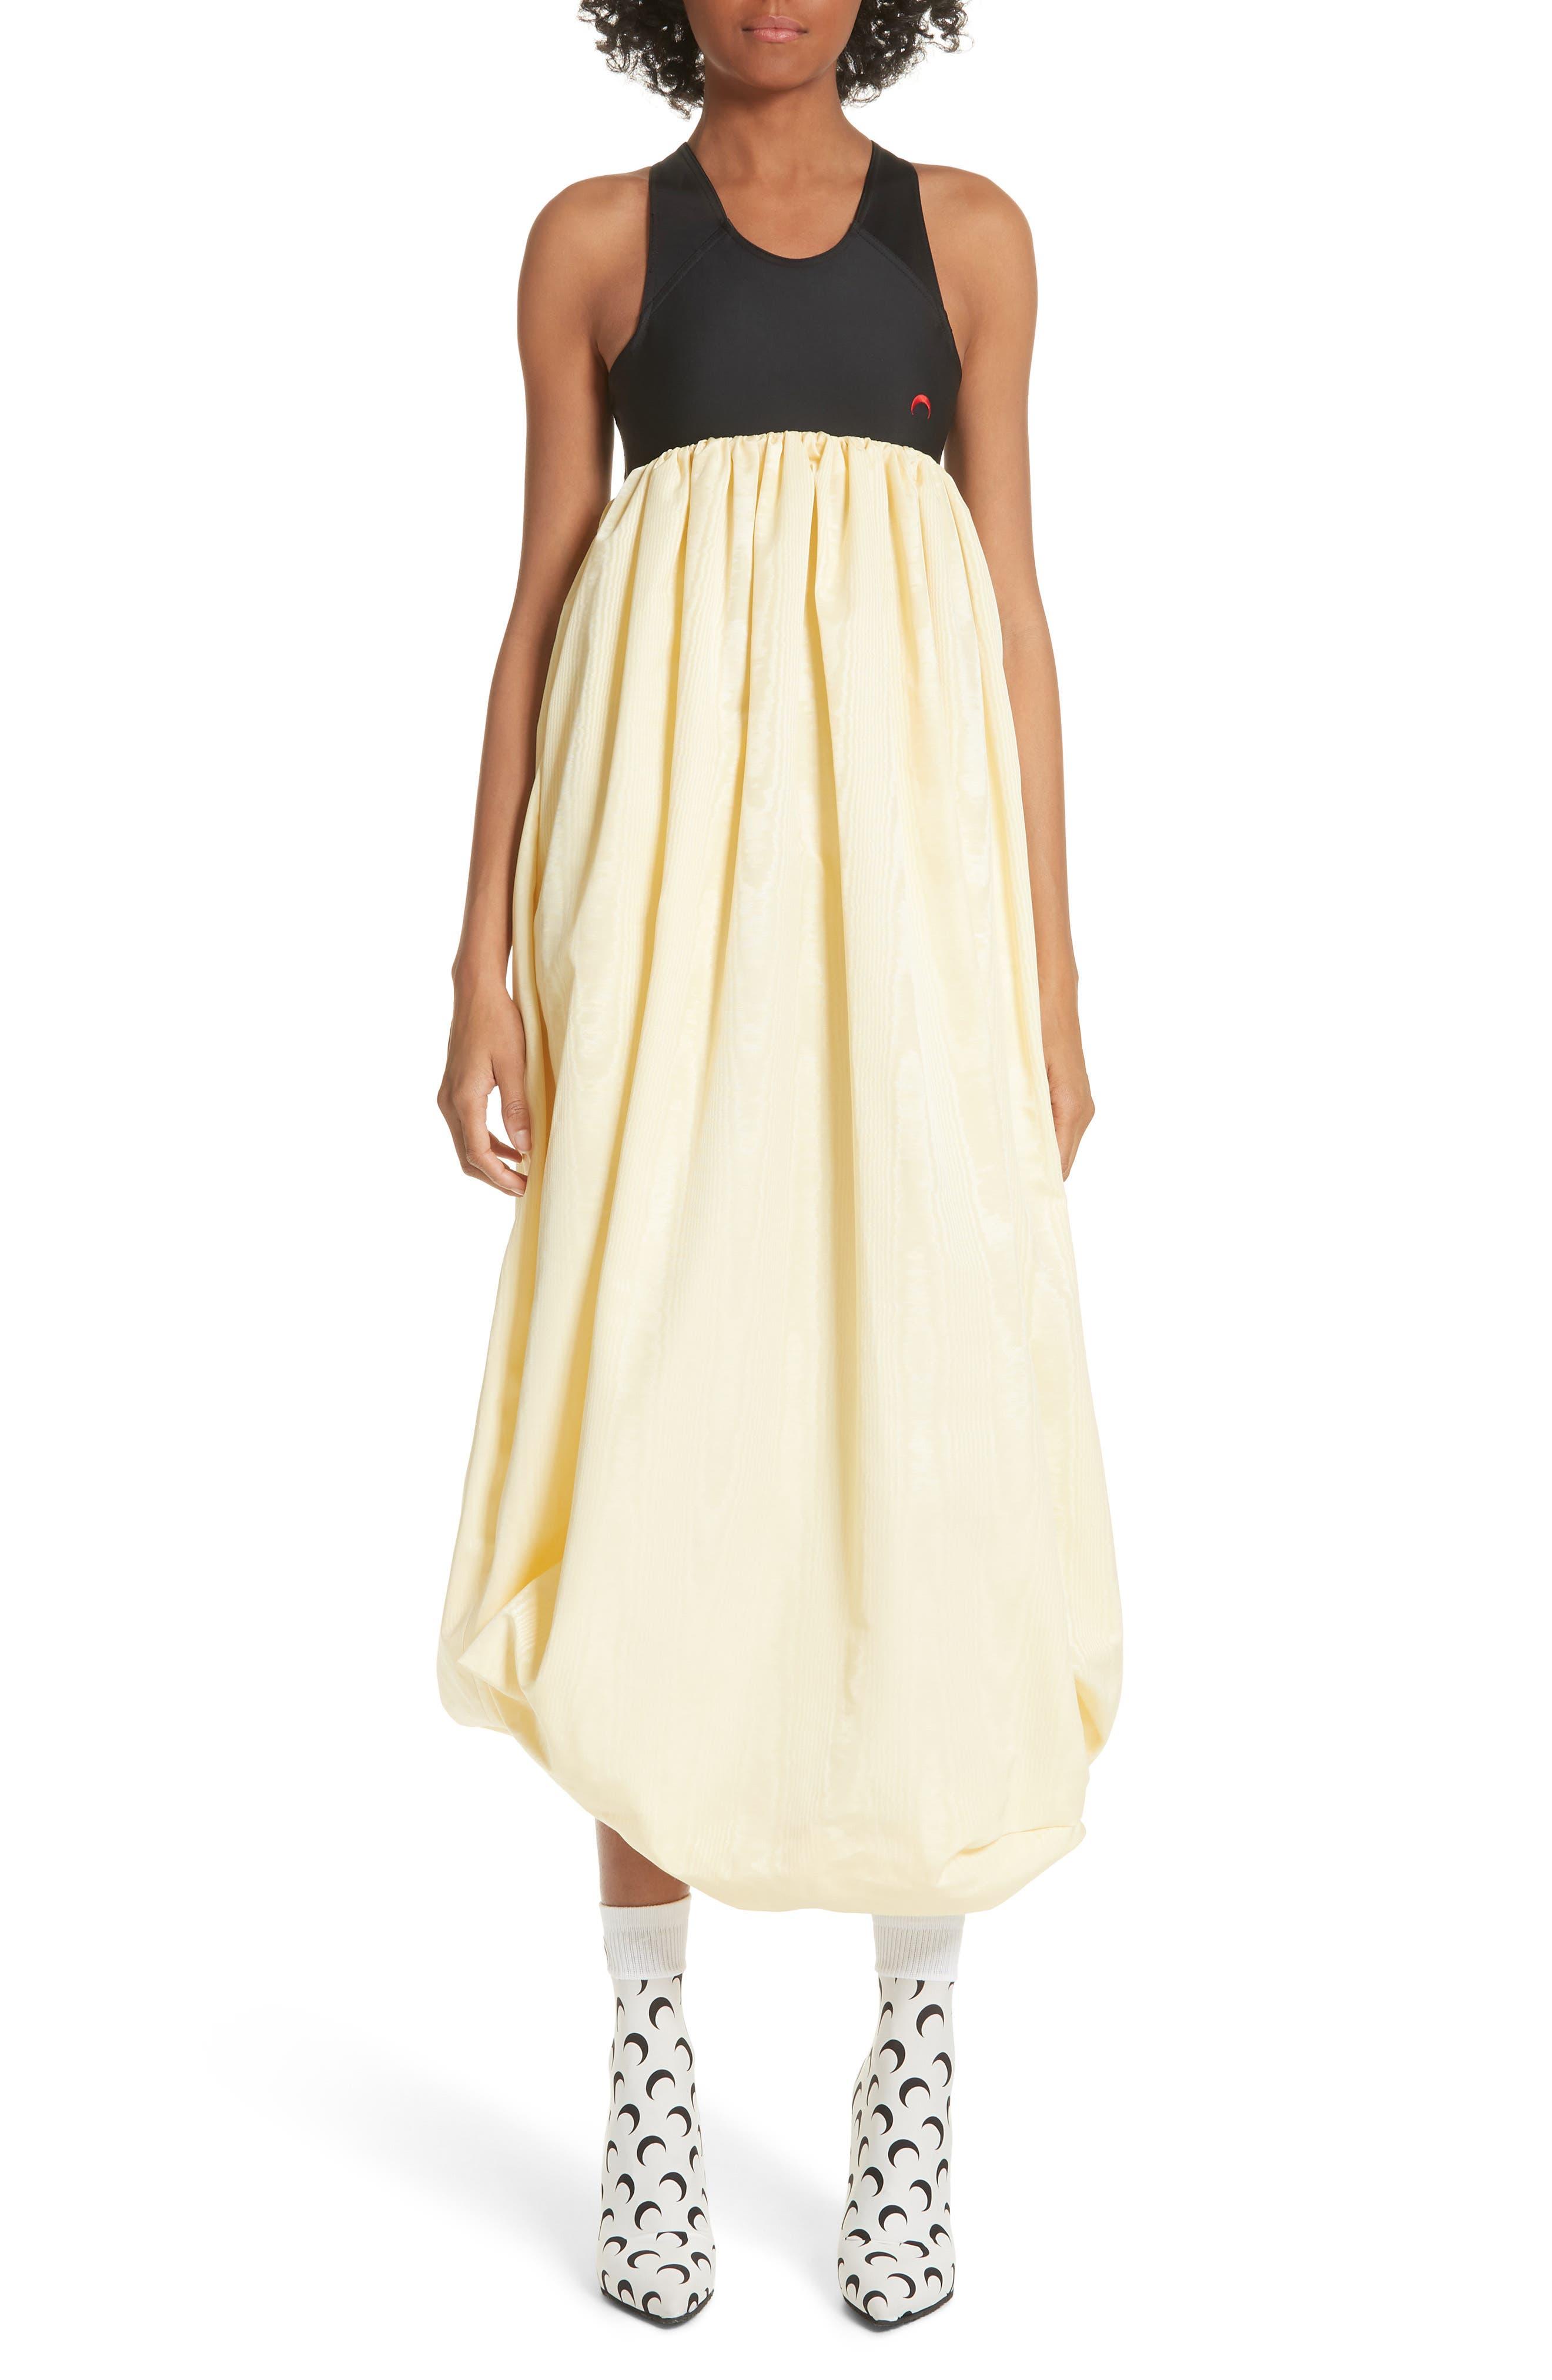 Hybrid Ball Dress,                             Main thumbnail 1, color,                             700